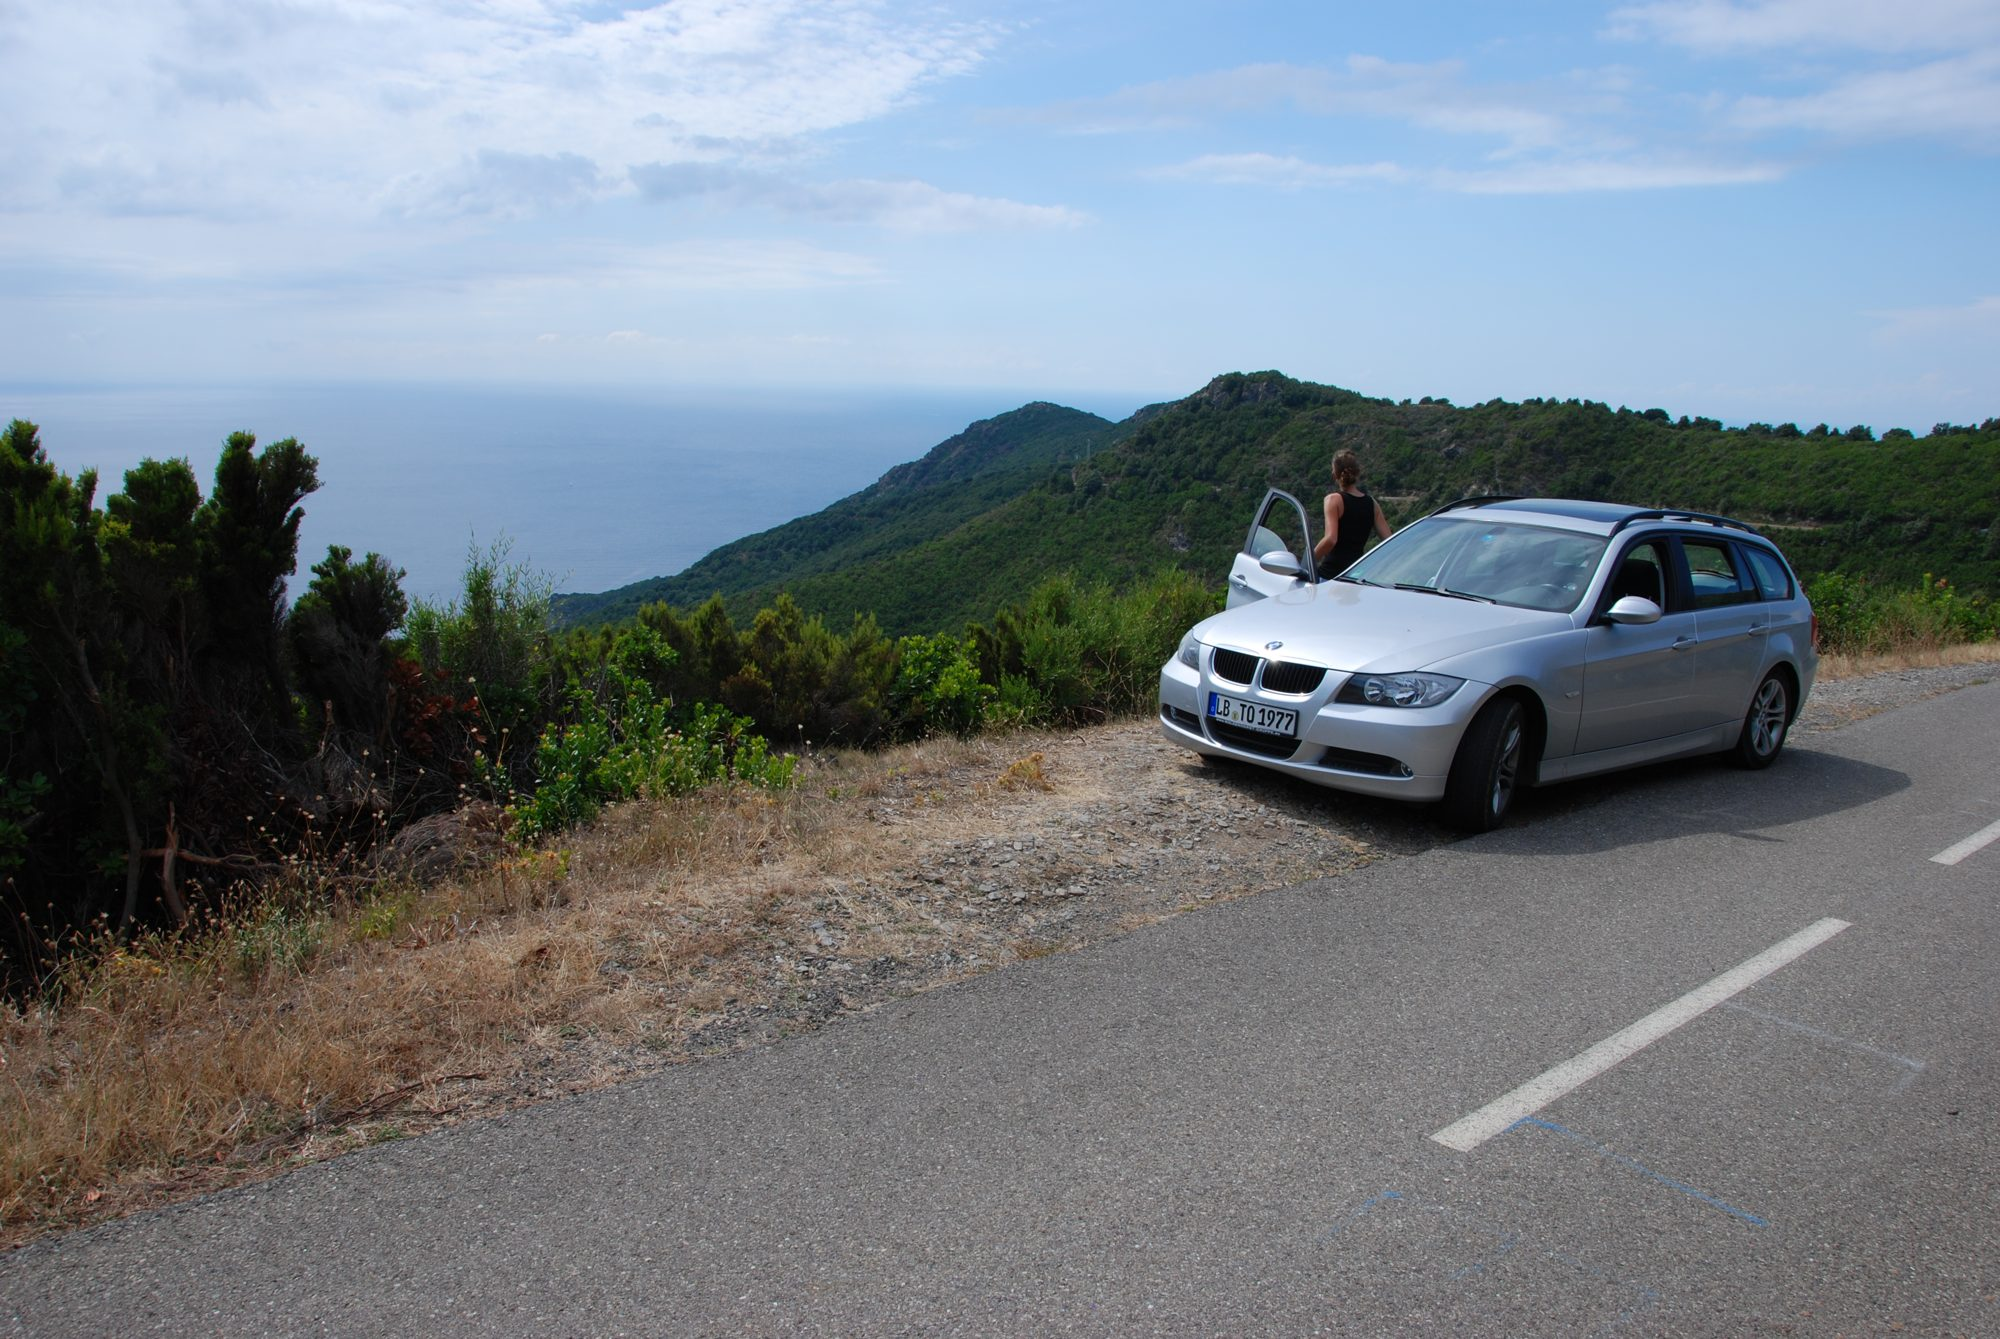 Angekommen am Cap Corse